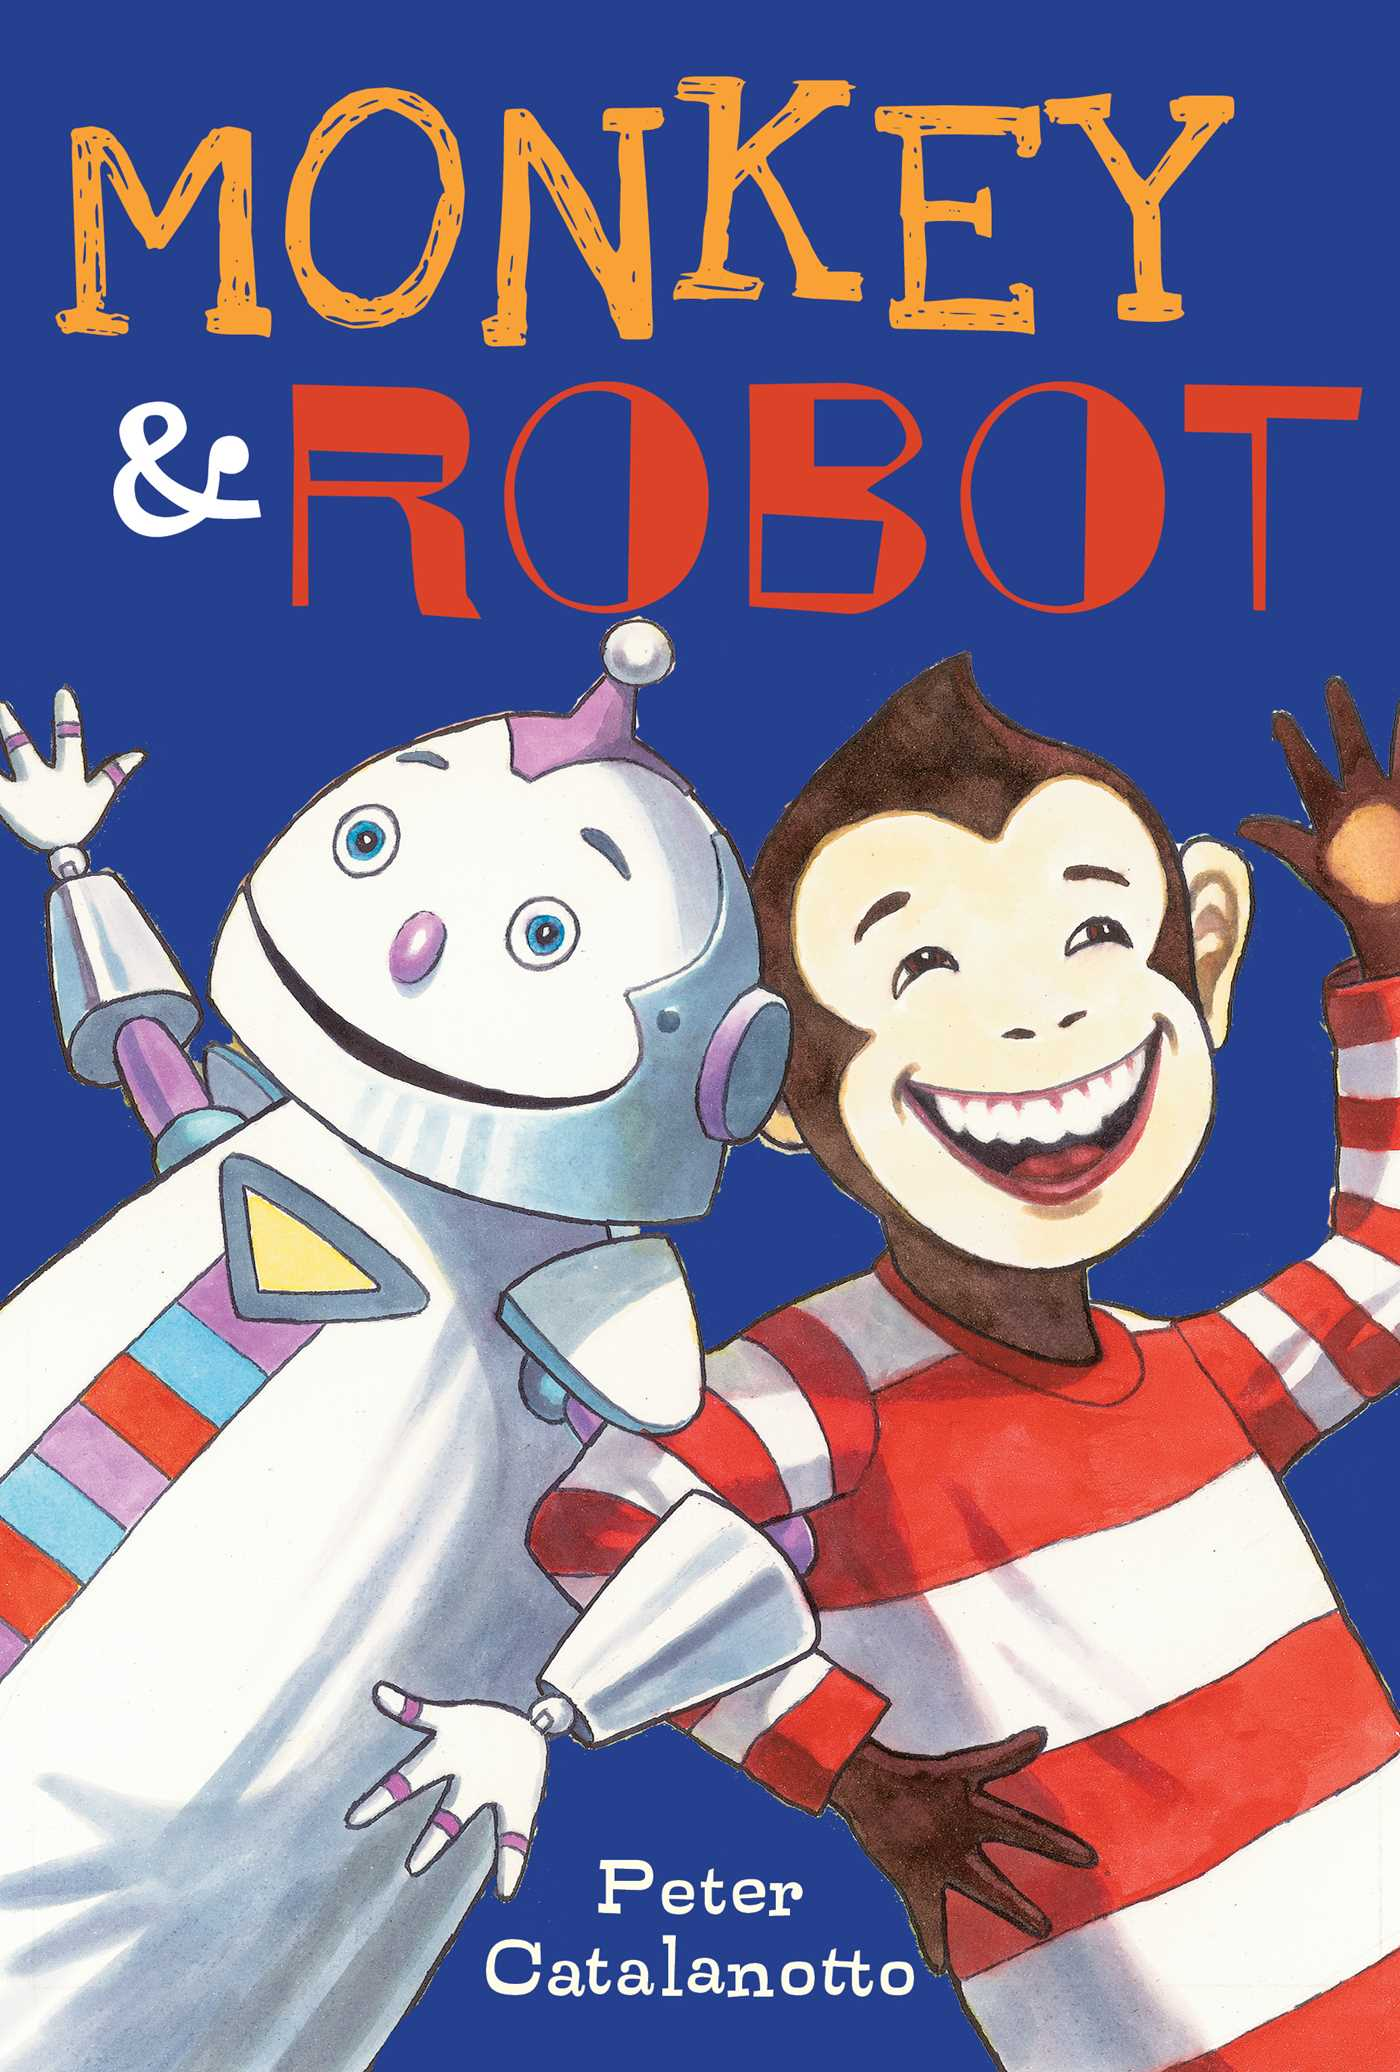 Monkey robot 9781442429796 hr